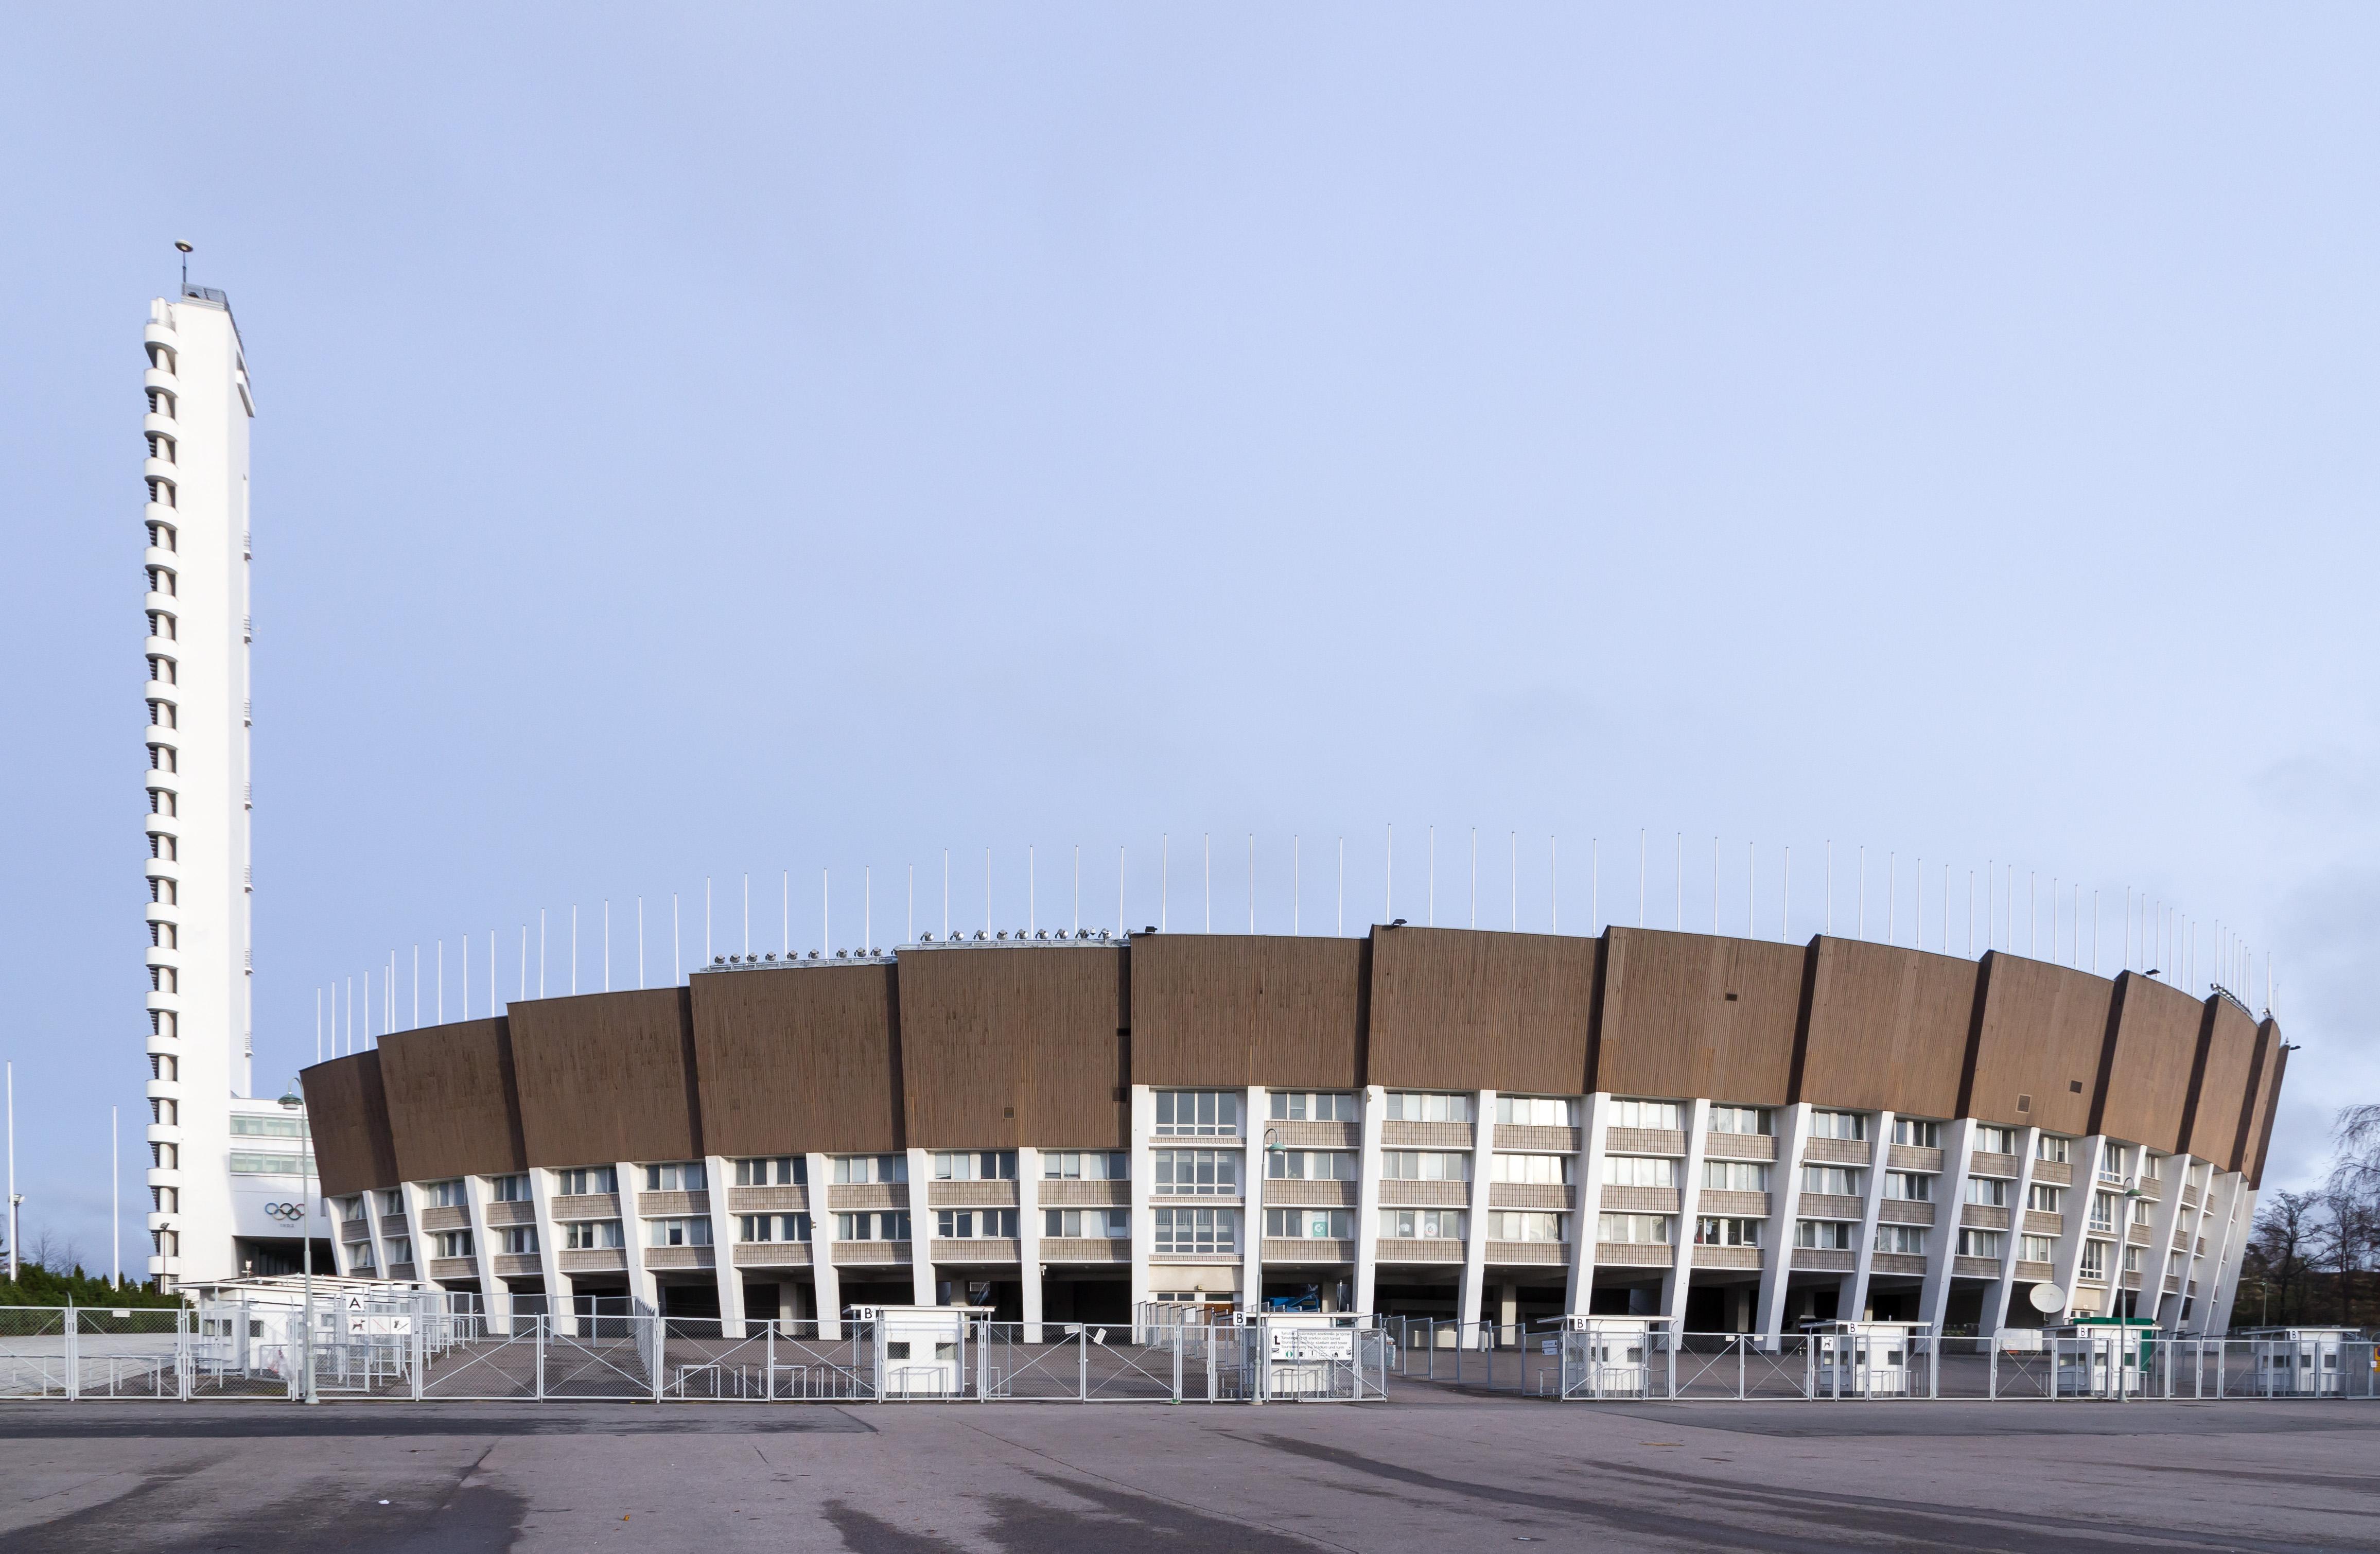 File:Helsinki Olympic Stadium-7147.jpg - Wikimedia Commons